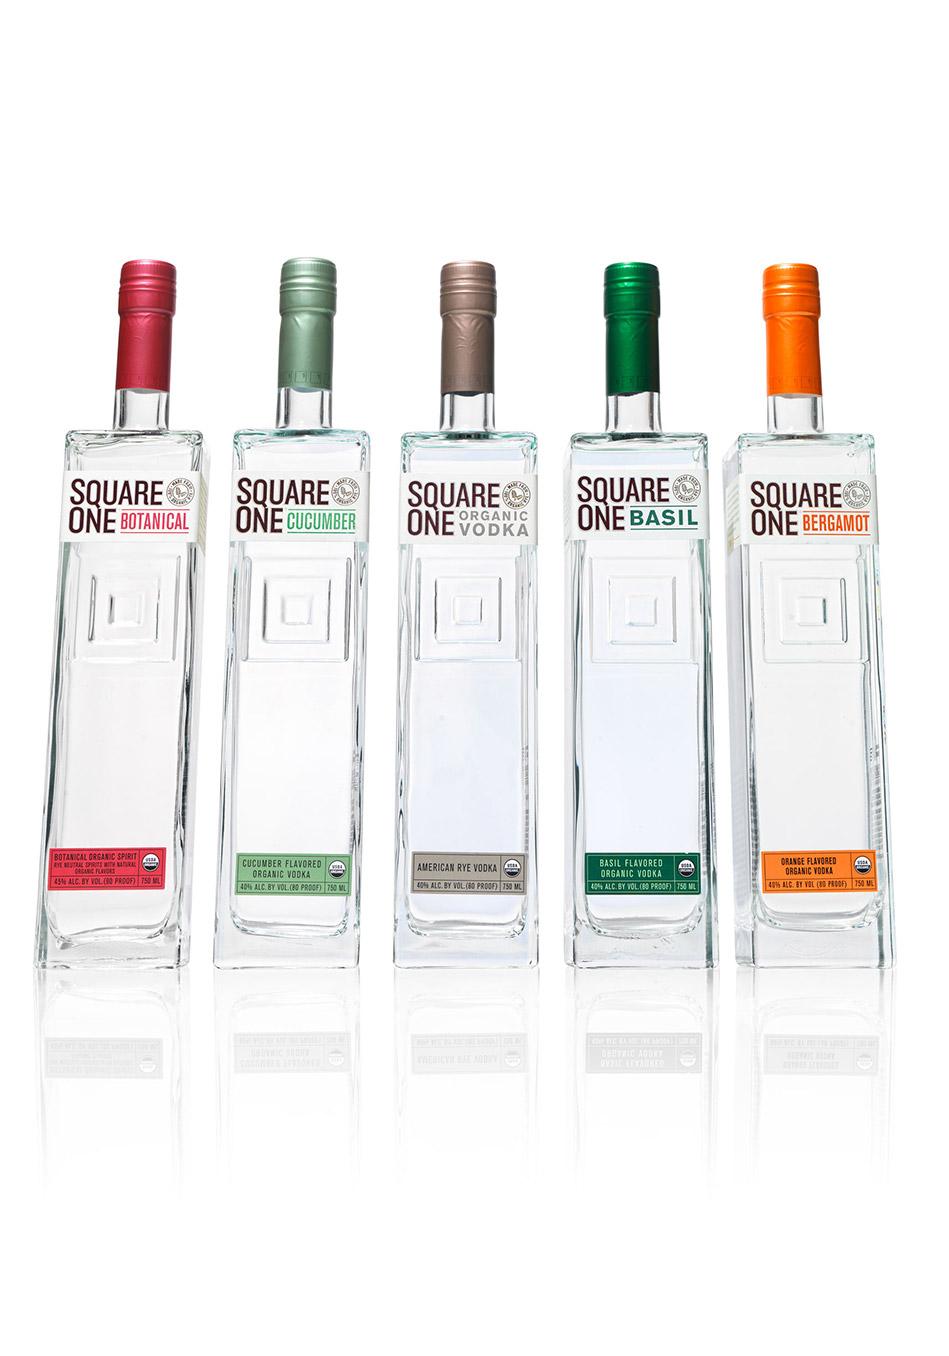 Oprahs Favorite Things 2015 - Square One Vodka